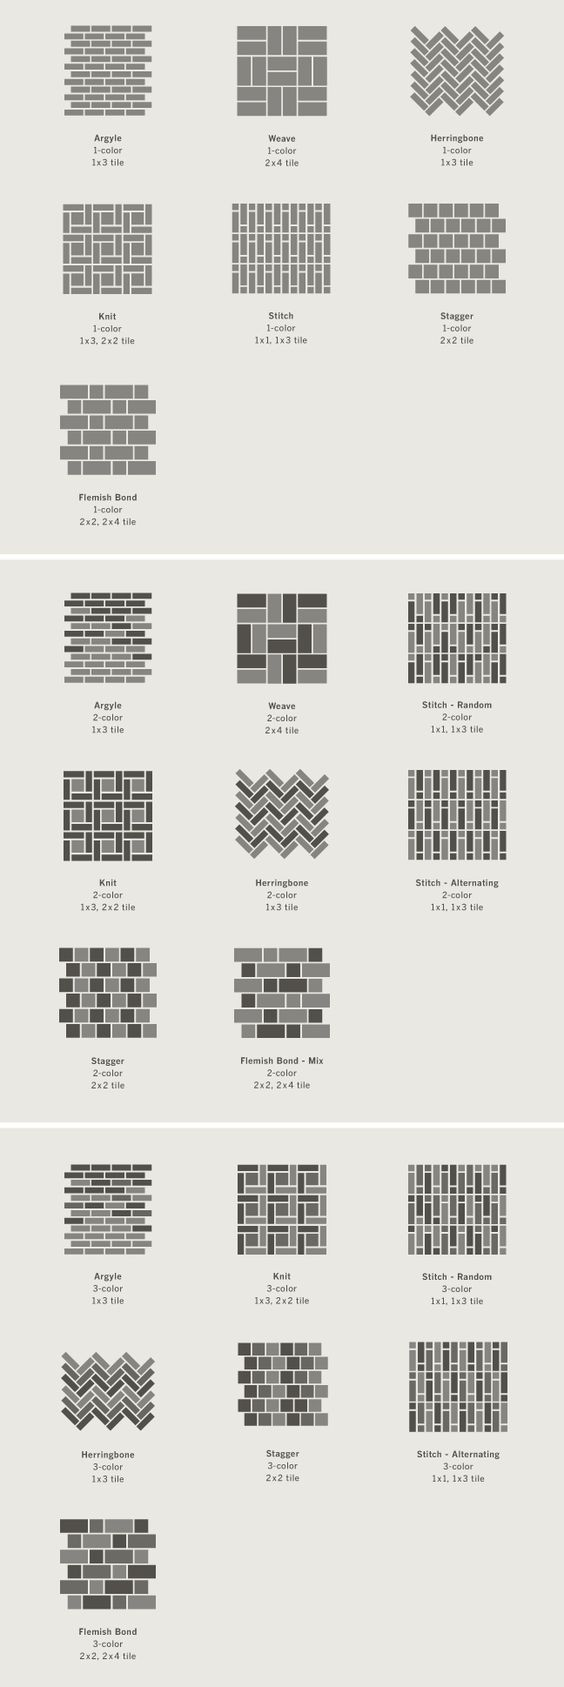 tile-patterns-kansas-city-interior-design-blog